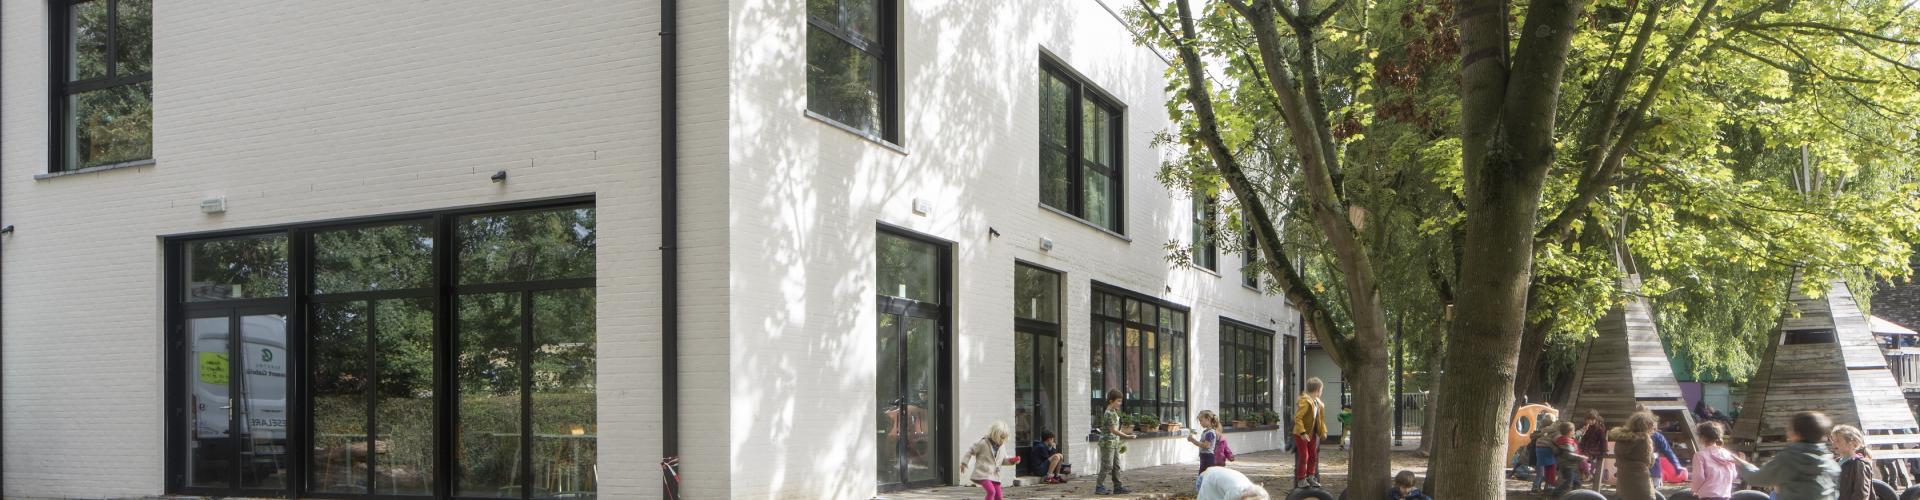 Freinetschool 't Groen Drieske Gentbrugge